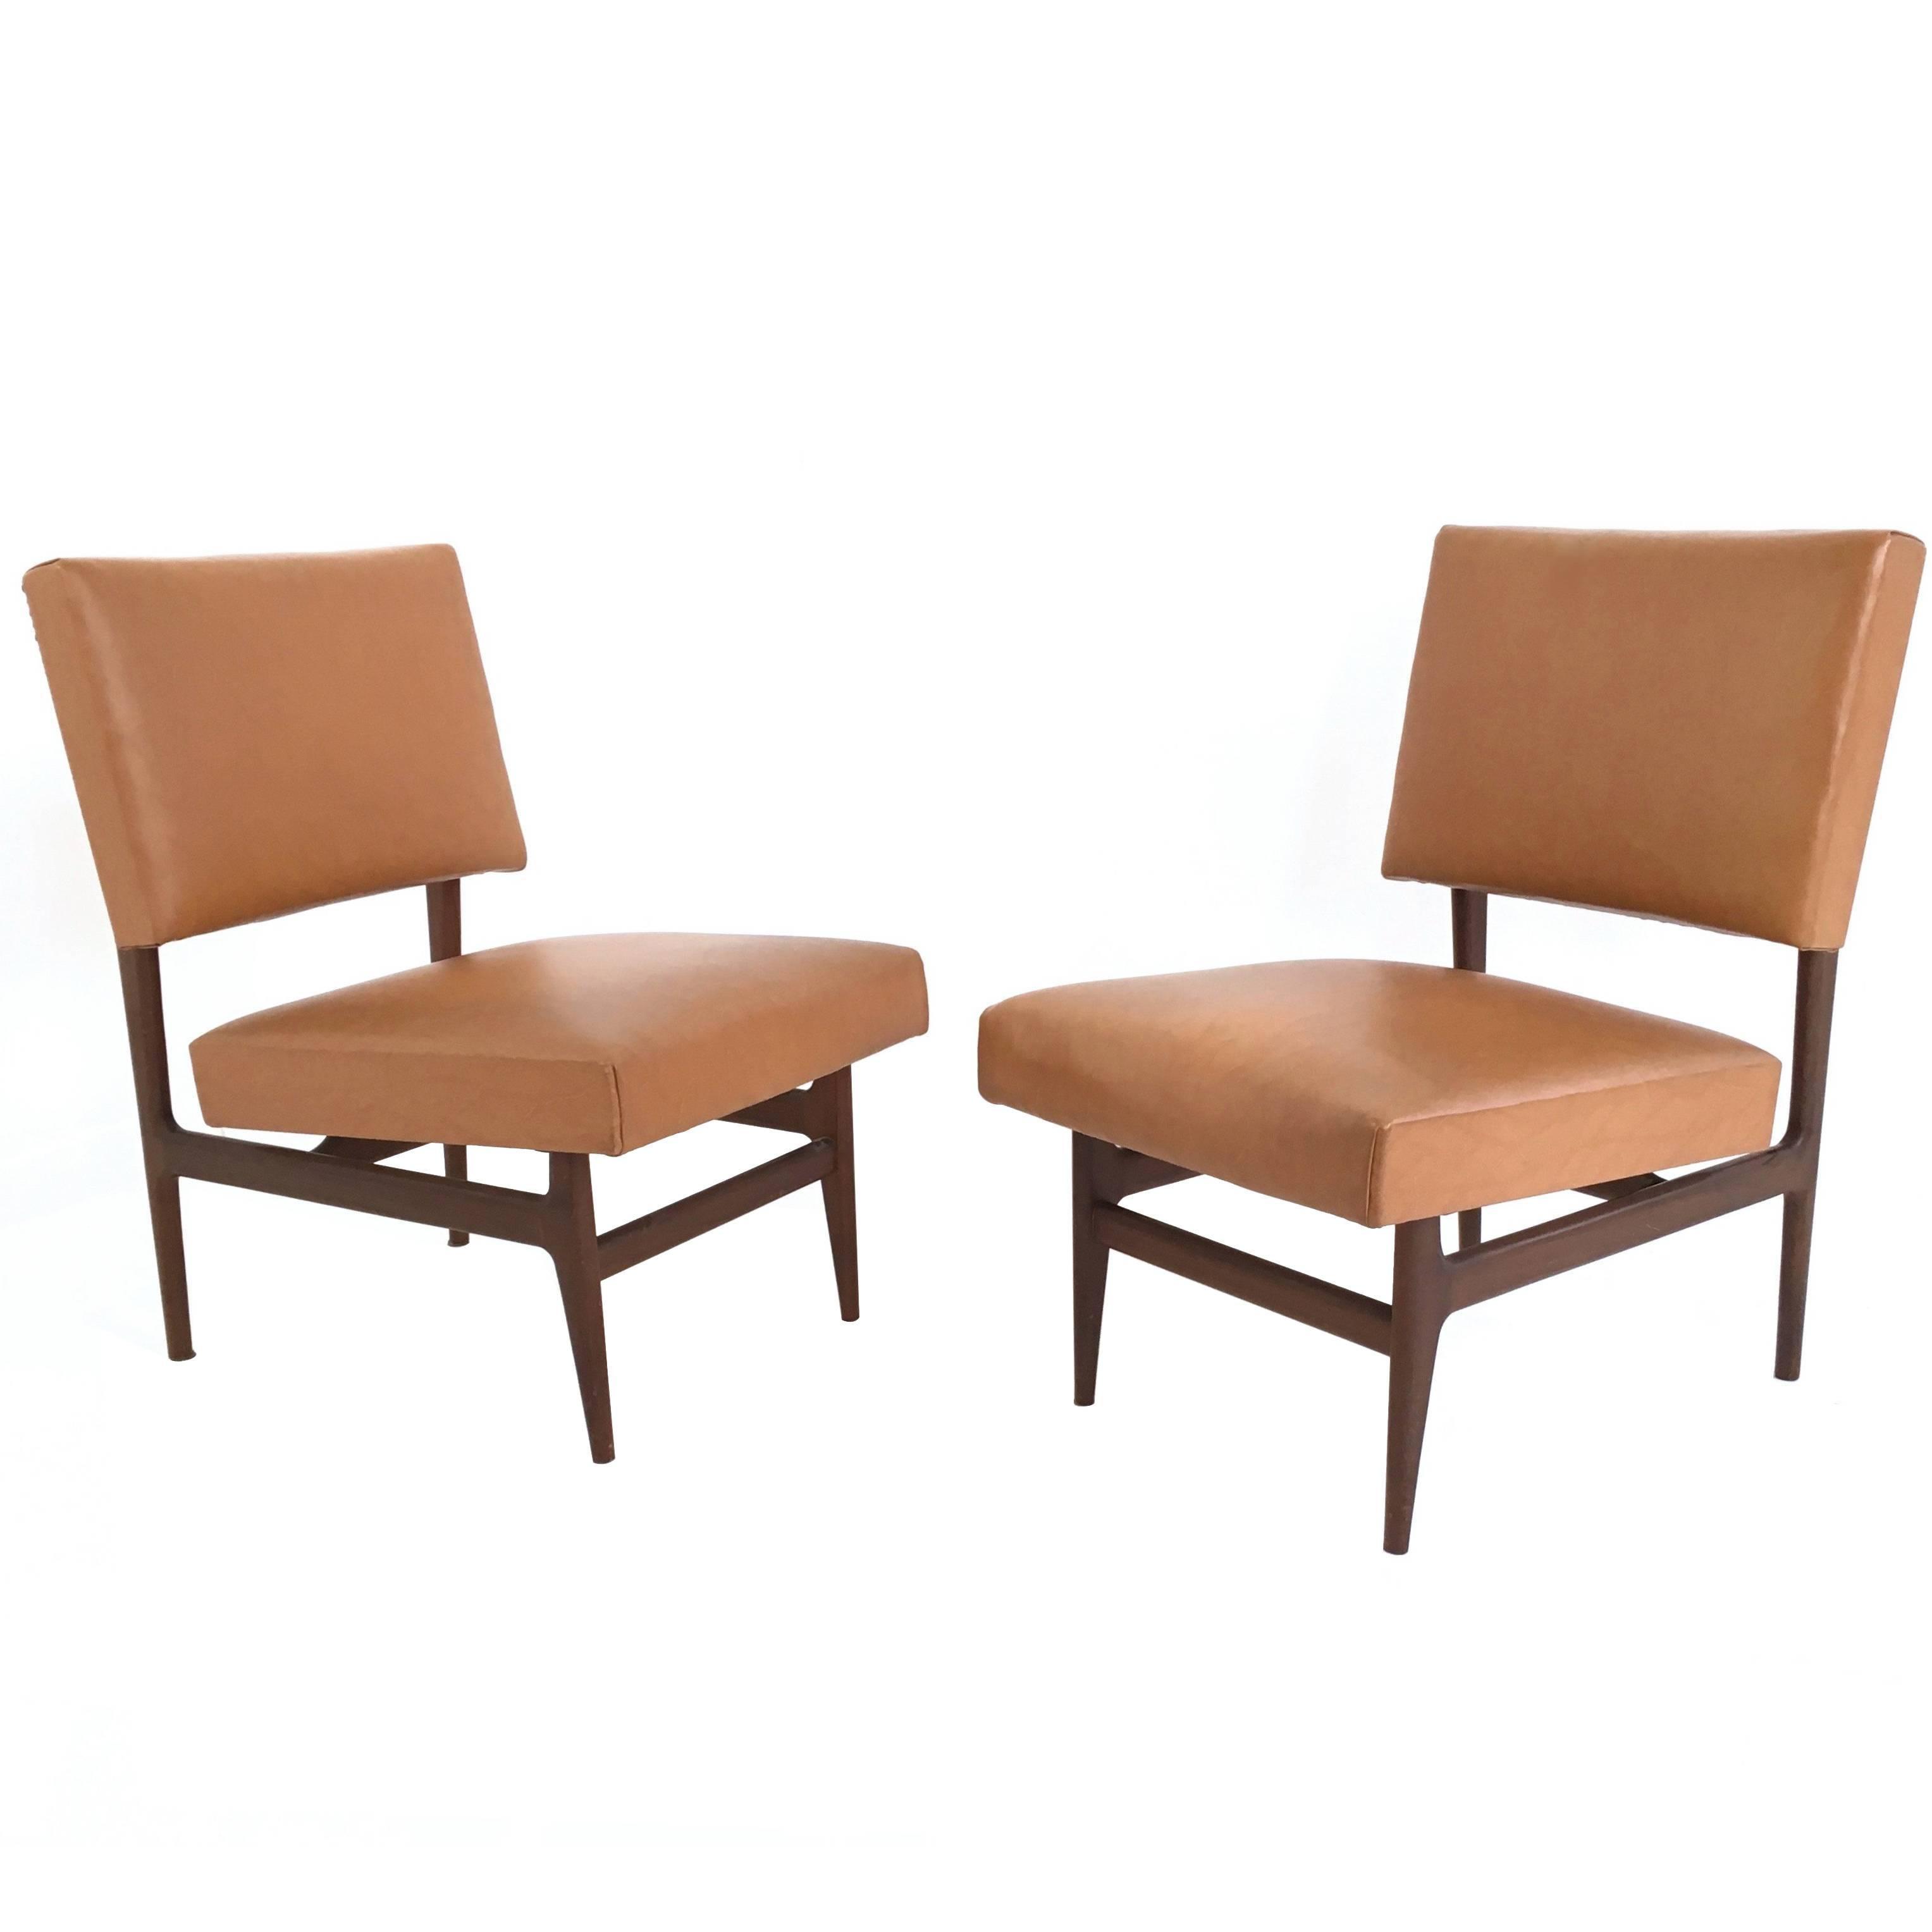 Pair of Midcentury Camel Skai Lounge Chairs with Ebonized Wood Frame, 1950s